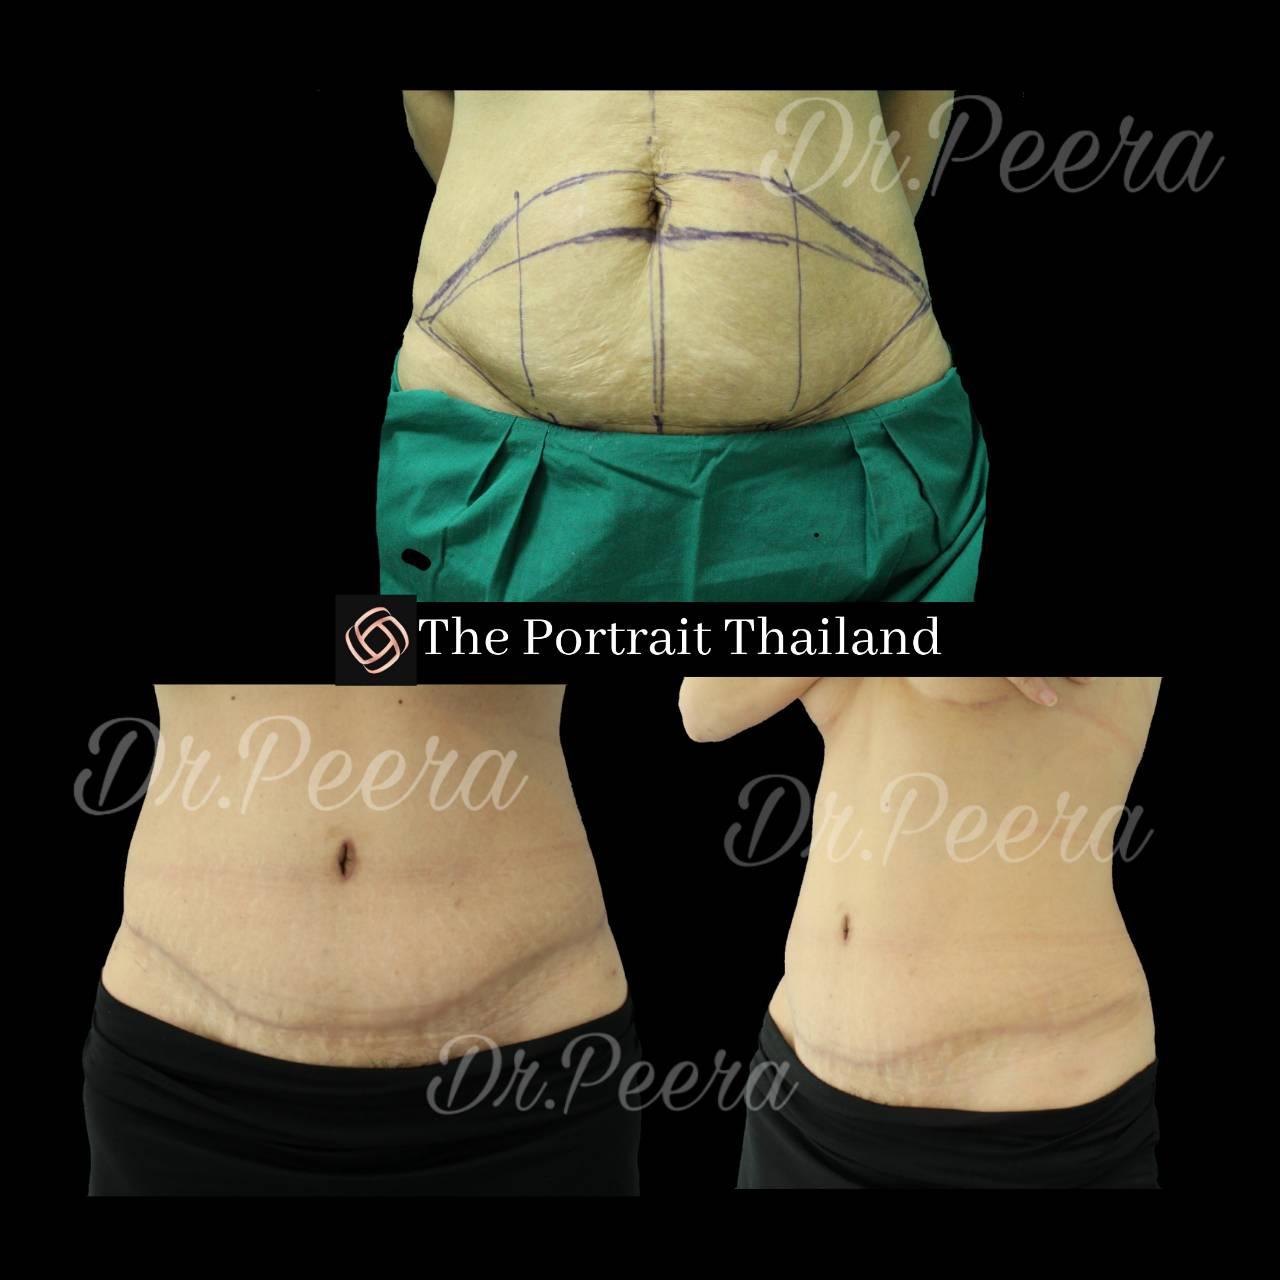 .jpg - abdominoplasty (ผ่าตัดกระชับหน้าท้อง)